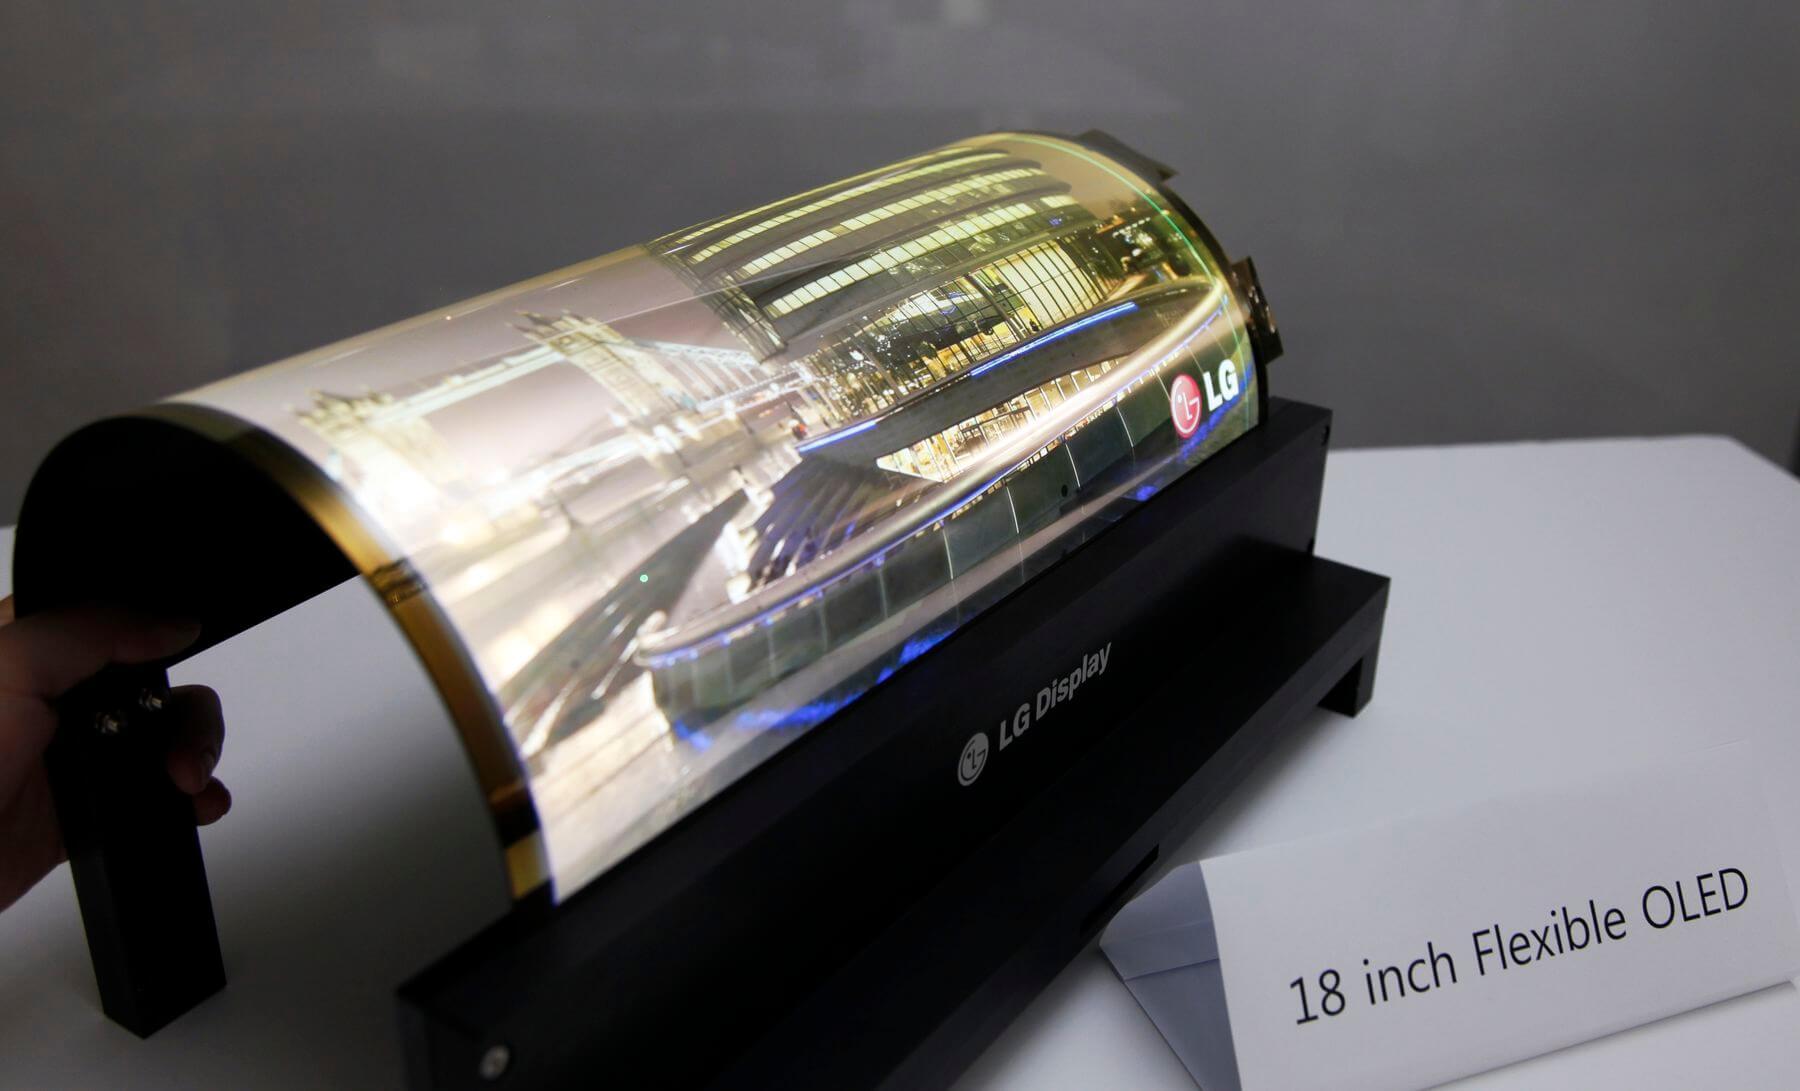 LG Display - Flexible